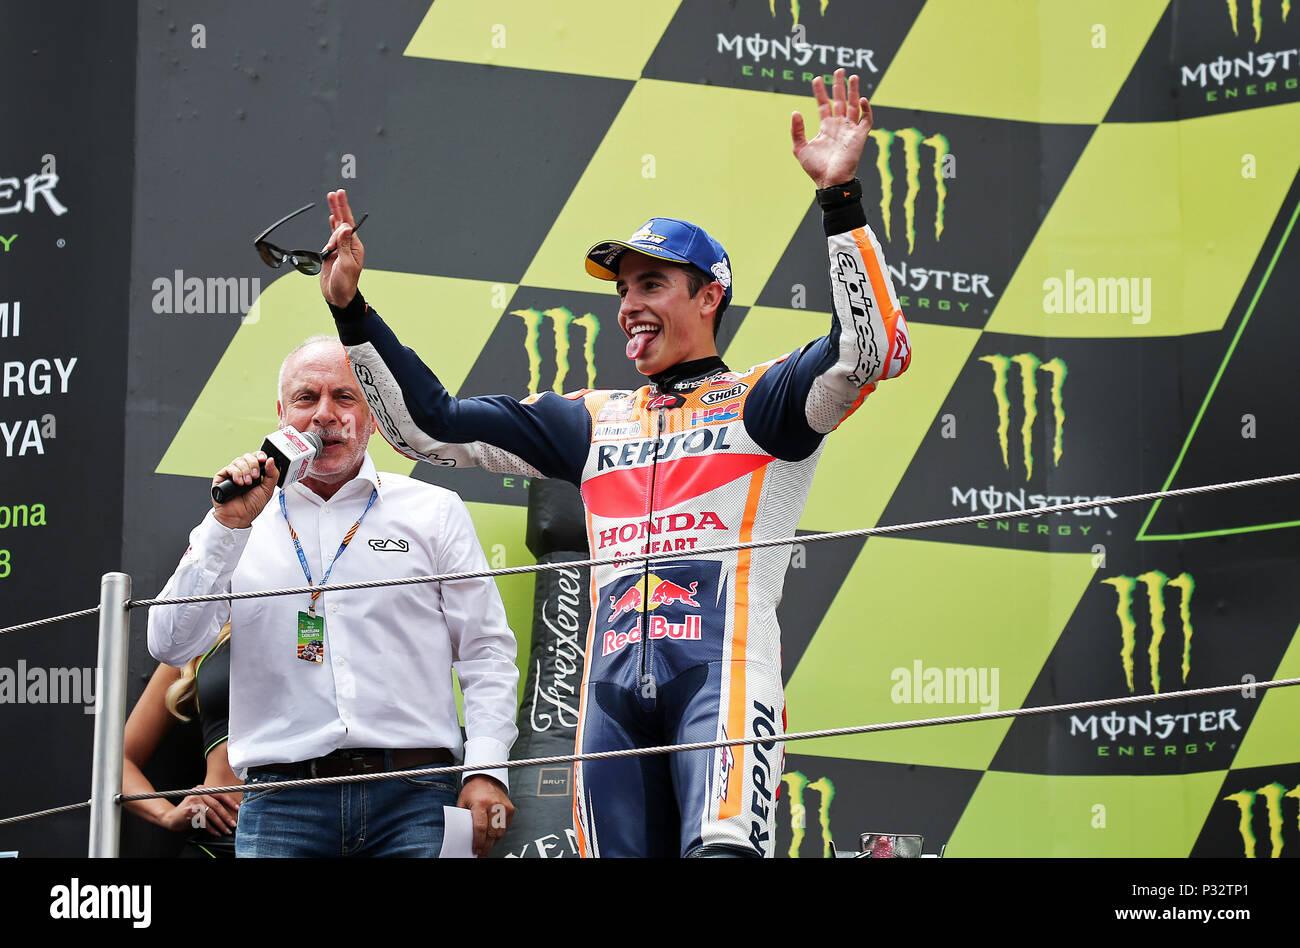 Barcelona -17th June 2018- SPAIN: Marc Marquez (Honda) in the podium of the  the GP Catalunya Moto GP, in the Barcelona-Catalunya Circuit, on 17th June 2018. Photo: Joan Valls/Urbanandsport/Cordon Press - Stock Image